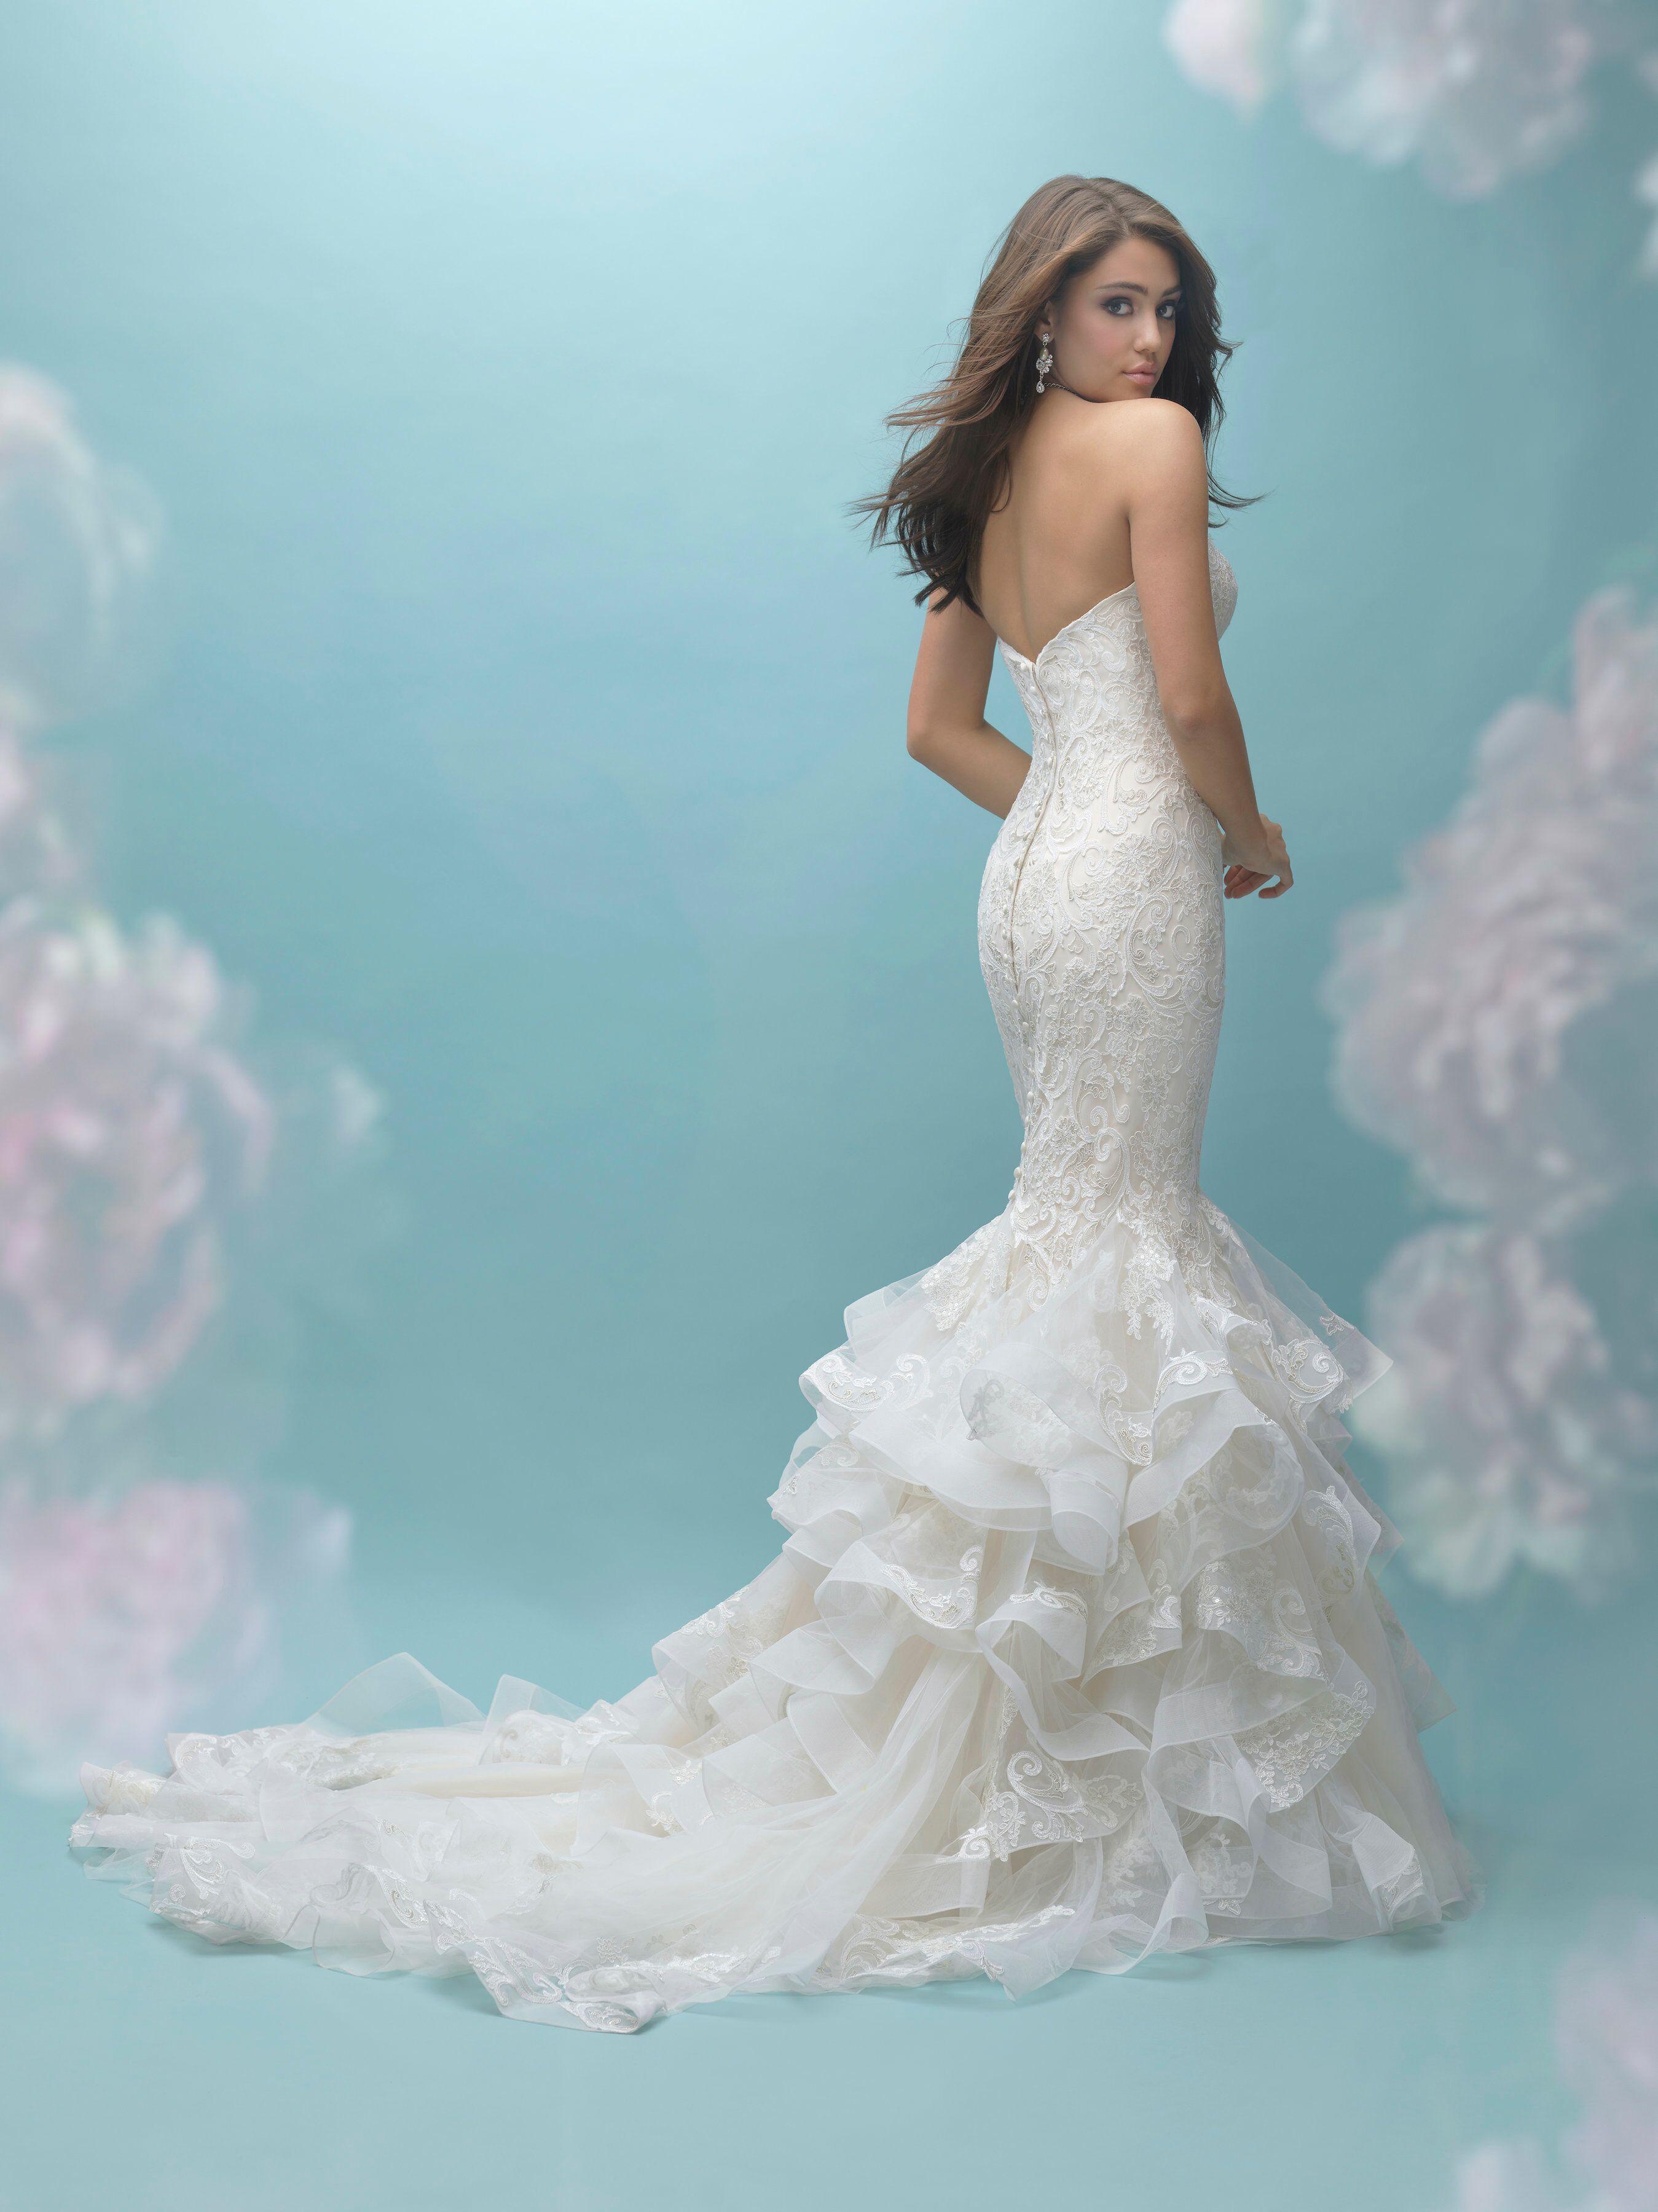 Beautiful Wedding Dresses Pensacola Contemporary - Wedding Ideas ...